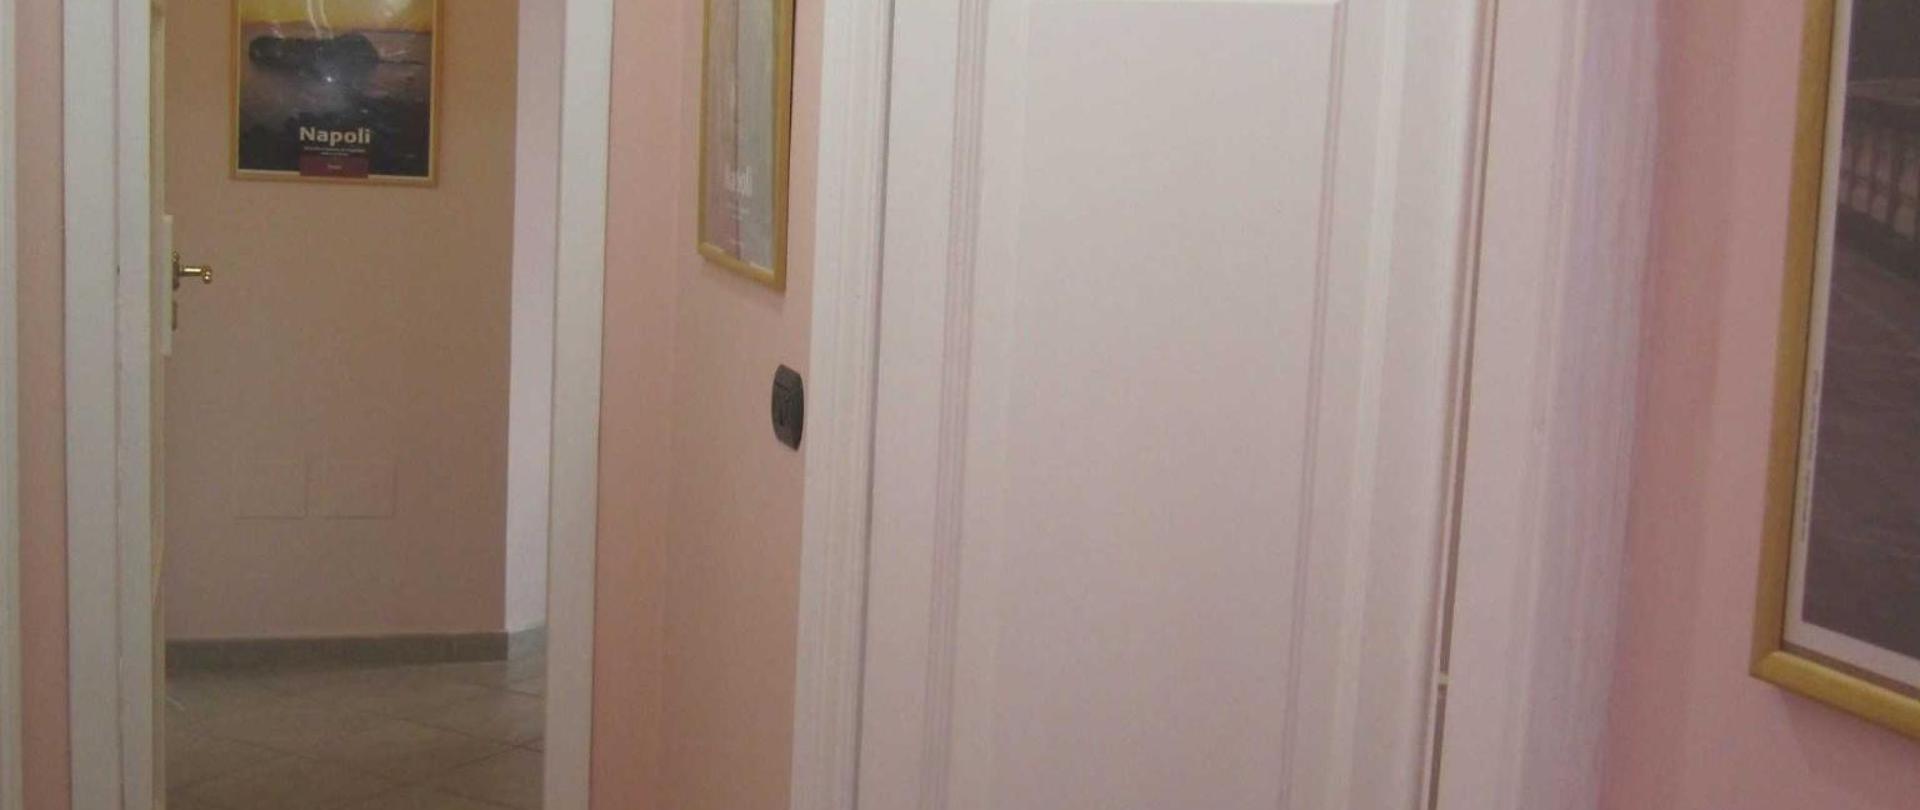 corridoio-porte.jpg